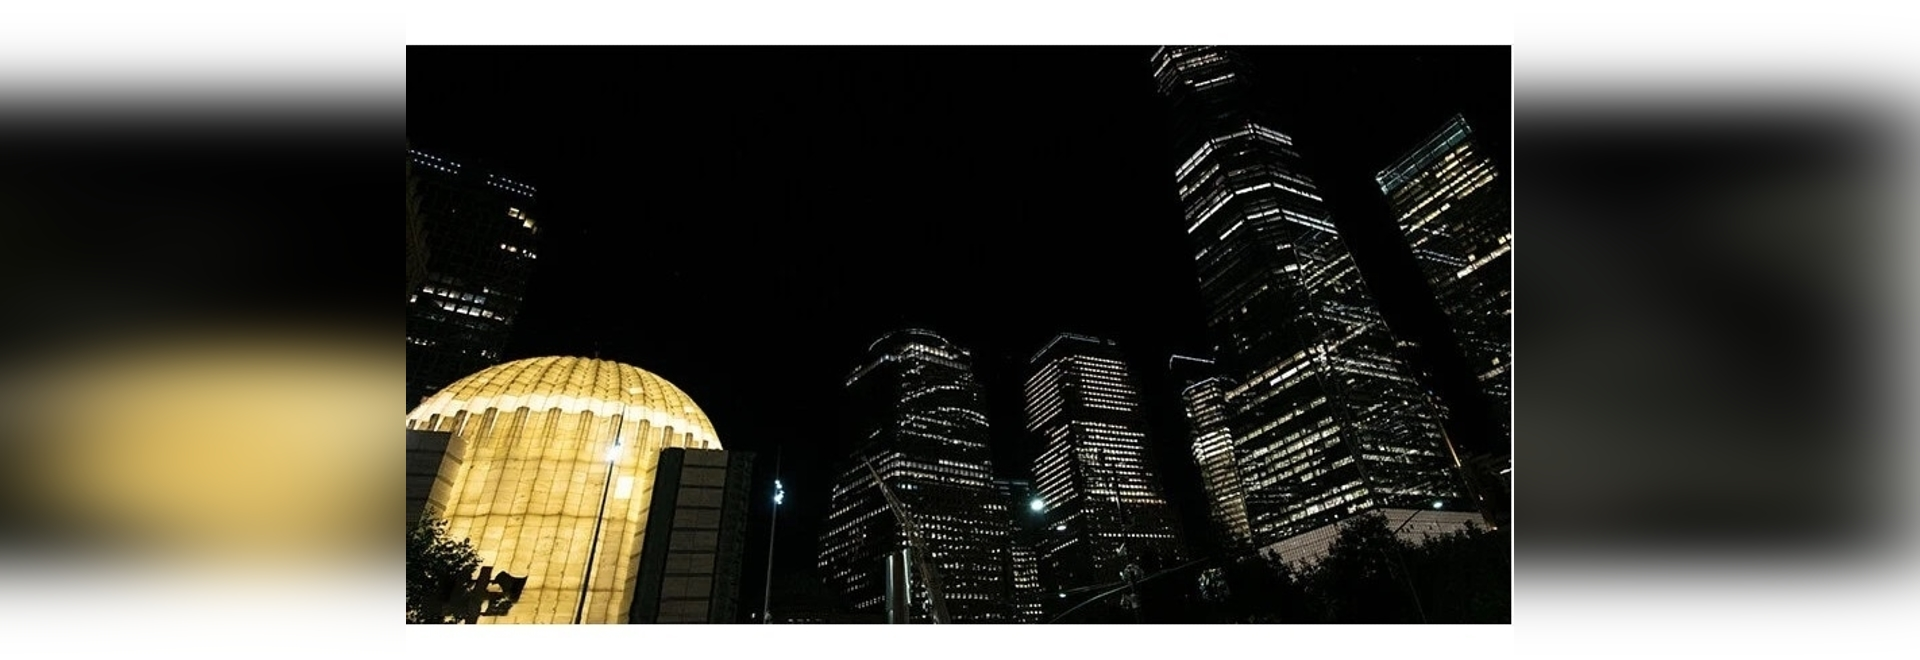 la iglesia de calatrava en el world trade center se ilumina por primera vez